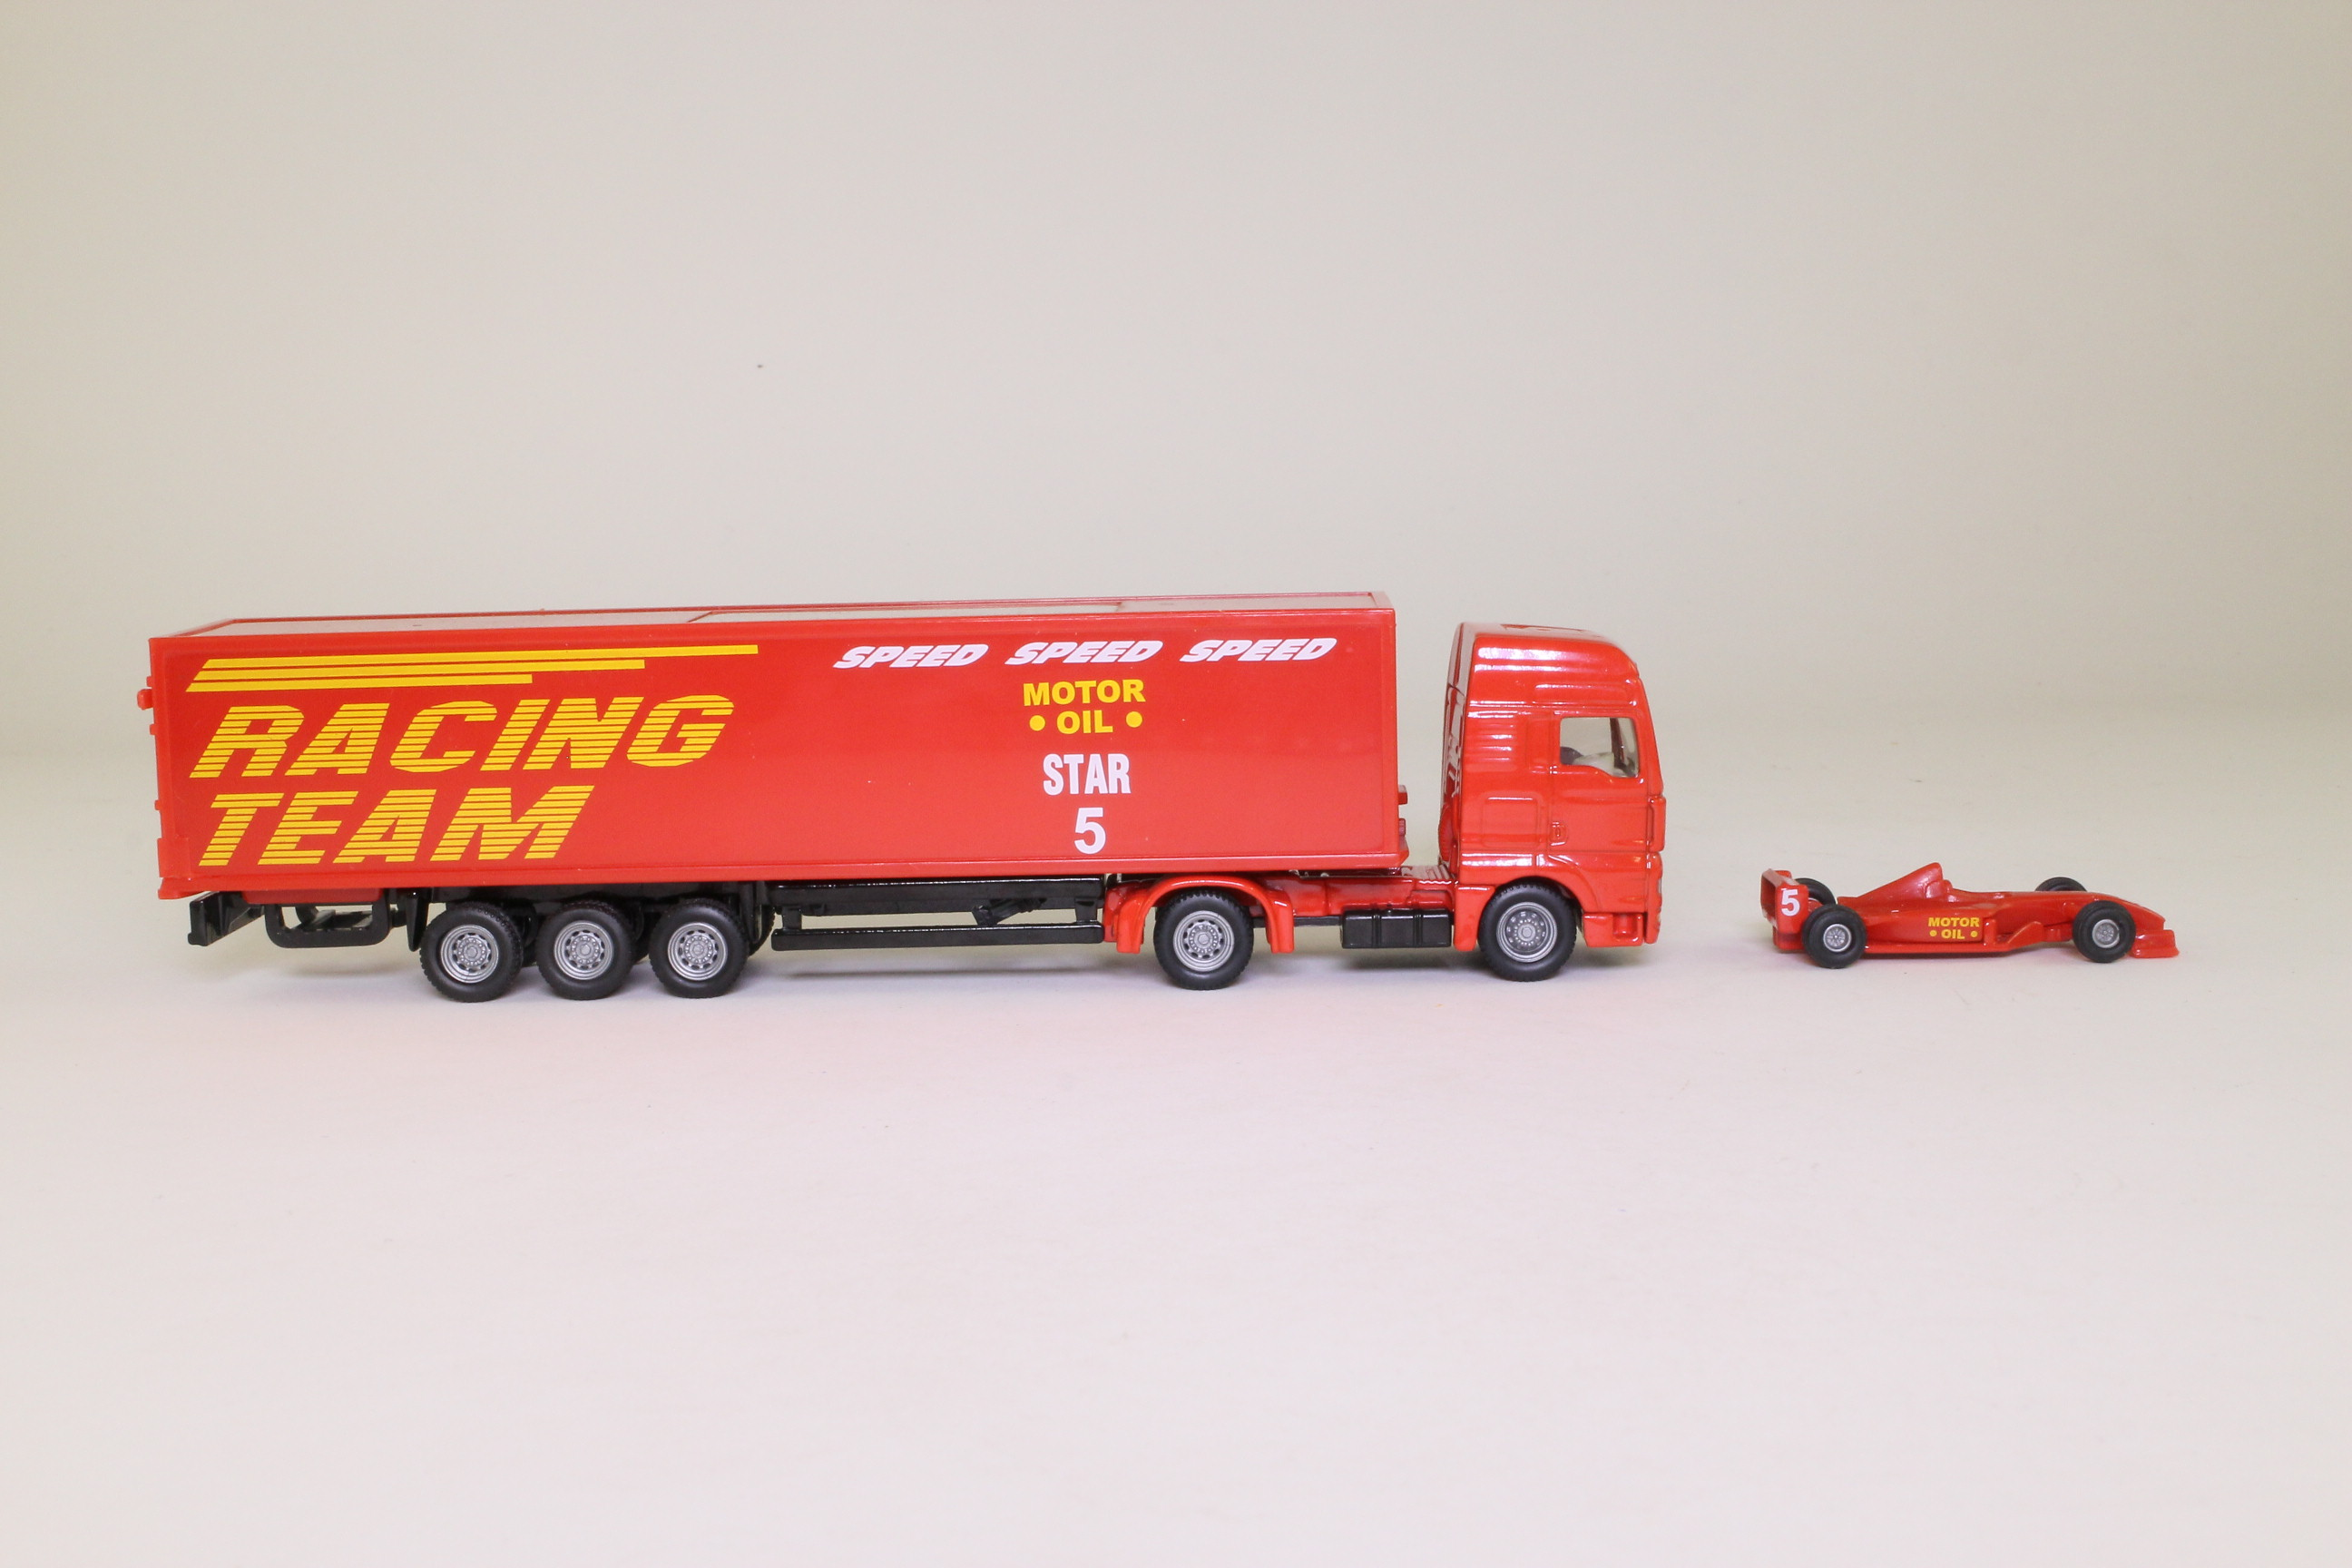 siku 1831 man artic truck racing car trailer 1 87 scale. Black Bedroom Furniture Sets. Home Design Ideas